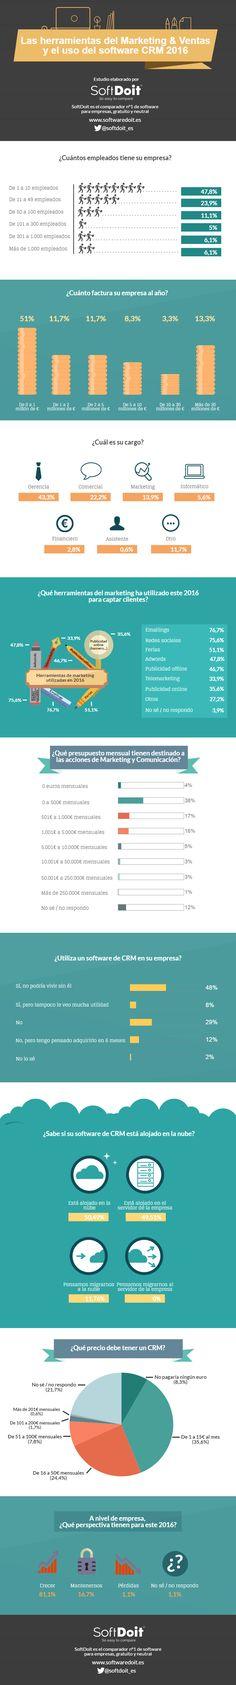 Estado del CRM en España #infografia